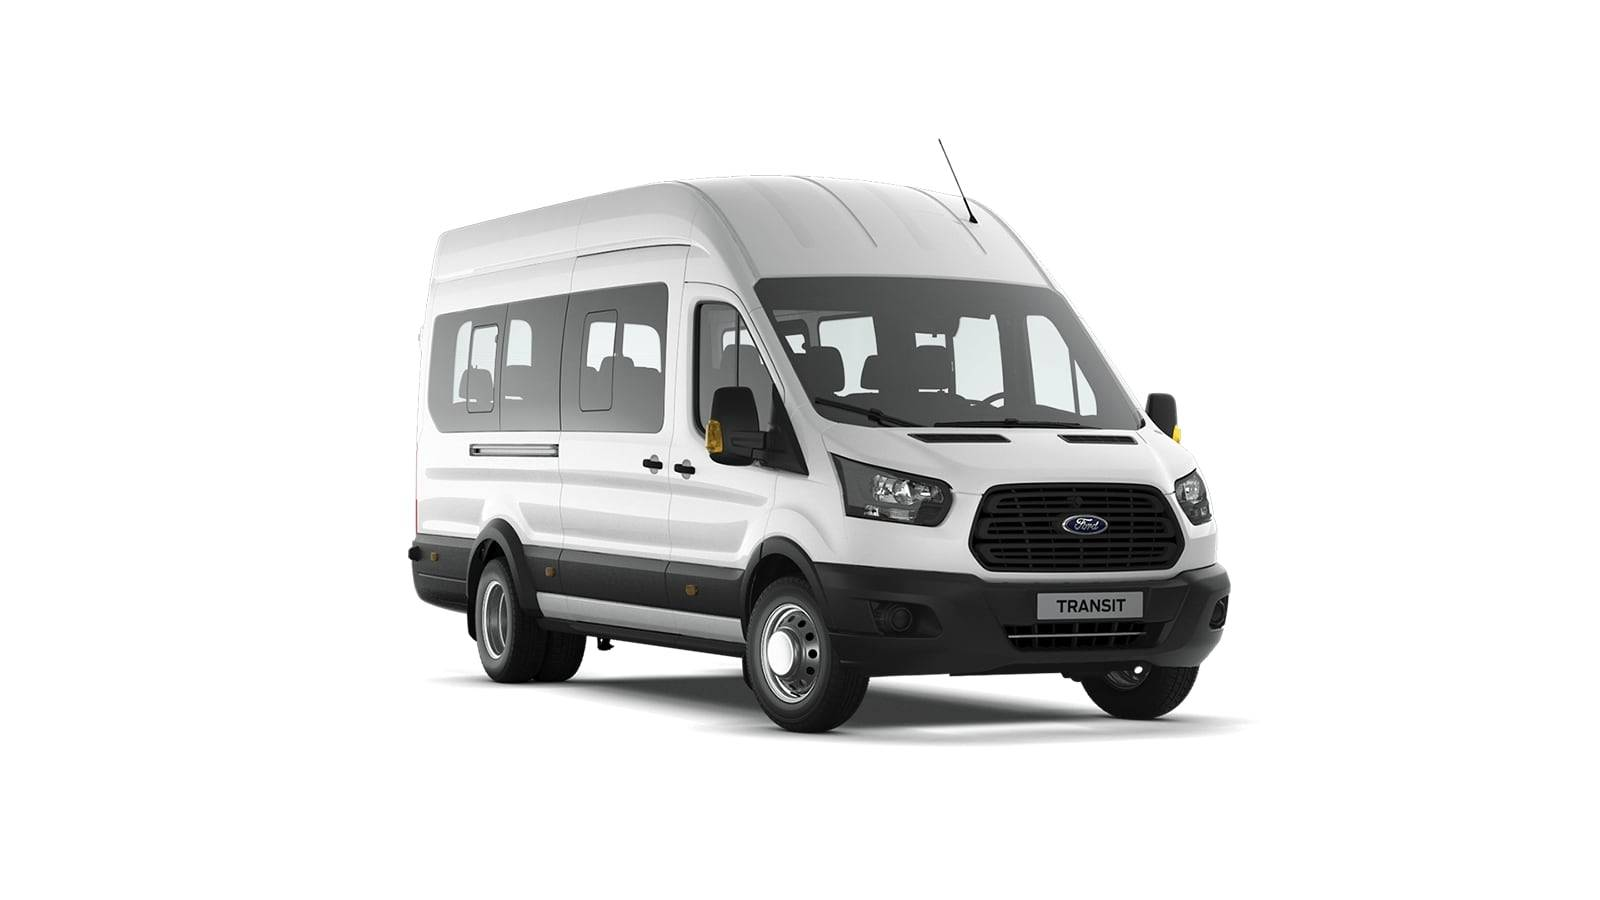 FORD TRANSIT 2.2 TDCI MT (135 л.с.) Маршрутное такси Маршрутный автобус (19+3+1)